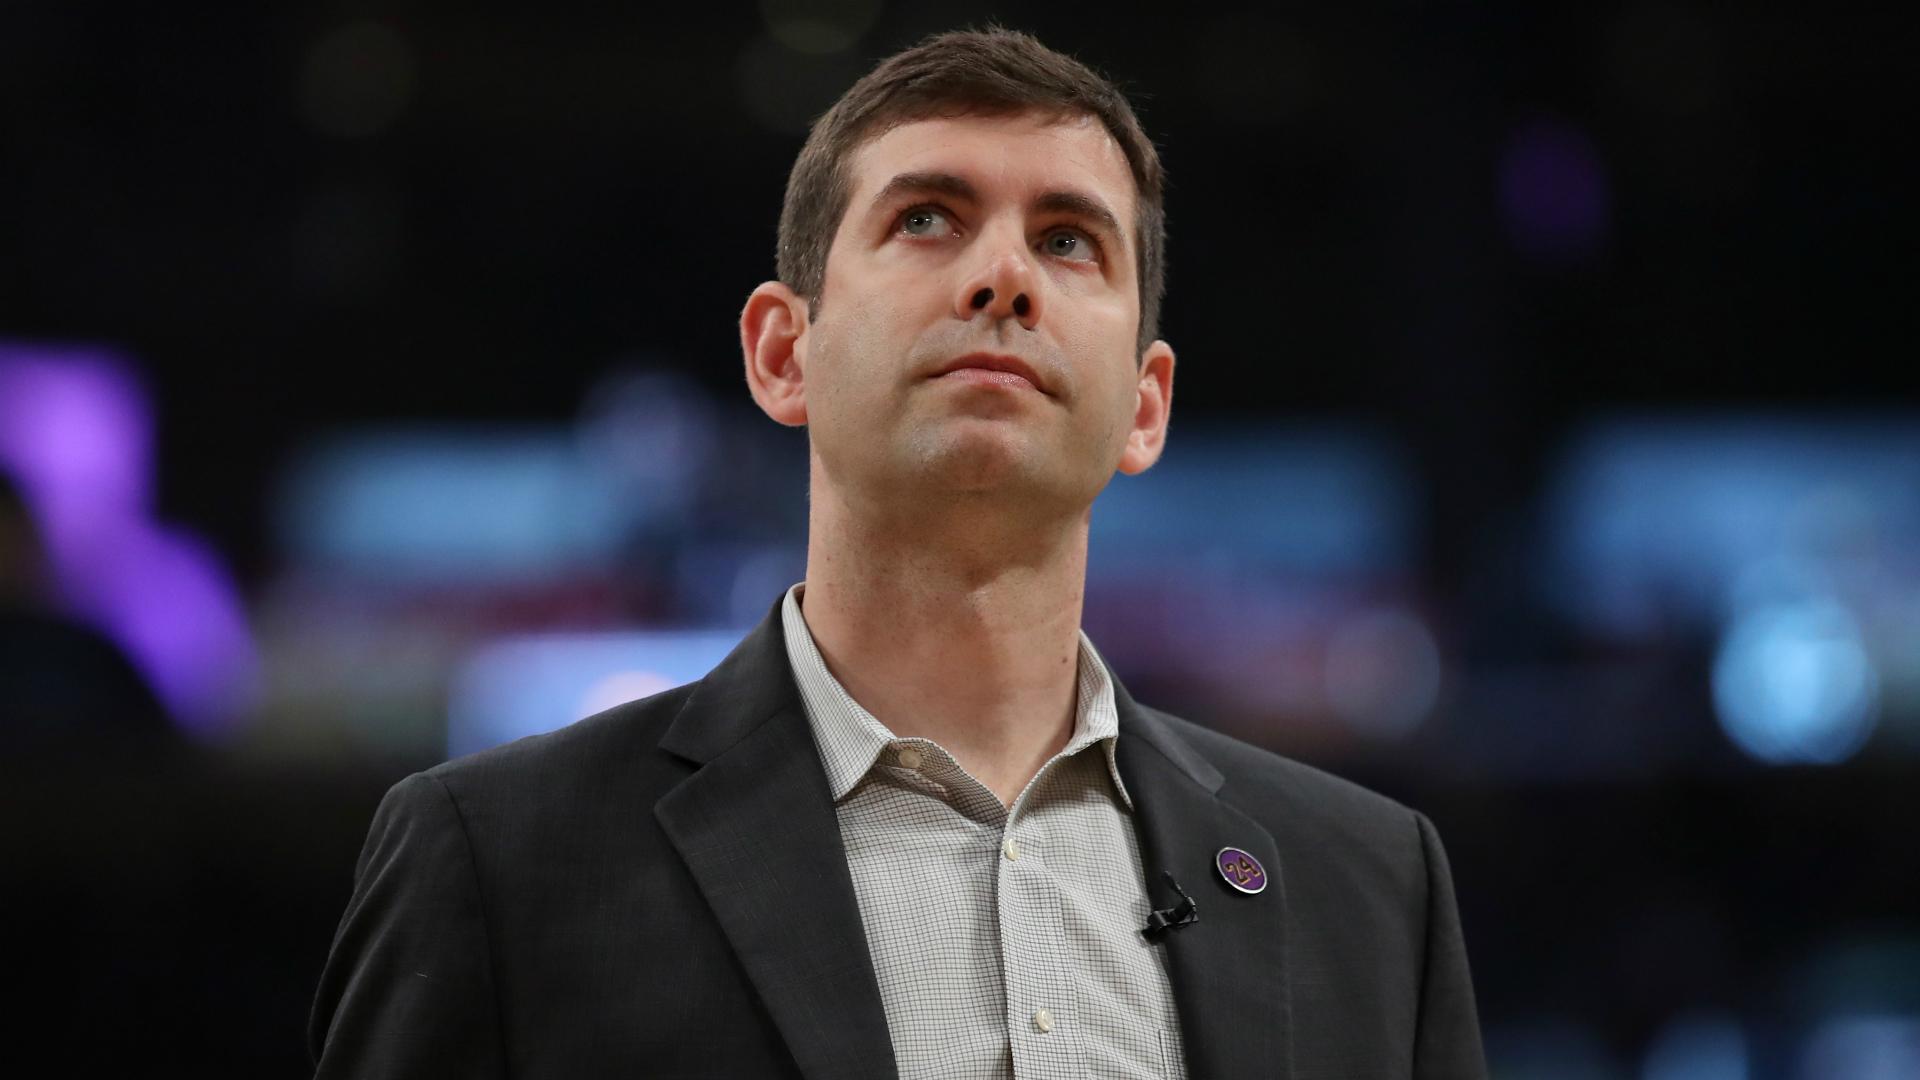 Celtics coach Stevens backing Boston to defy odds and reach NBA Finals